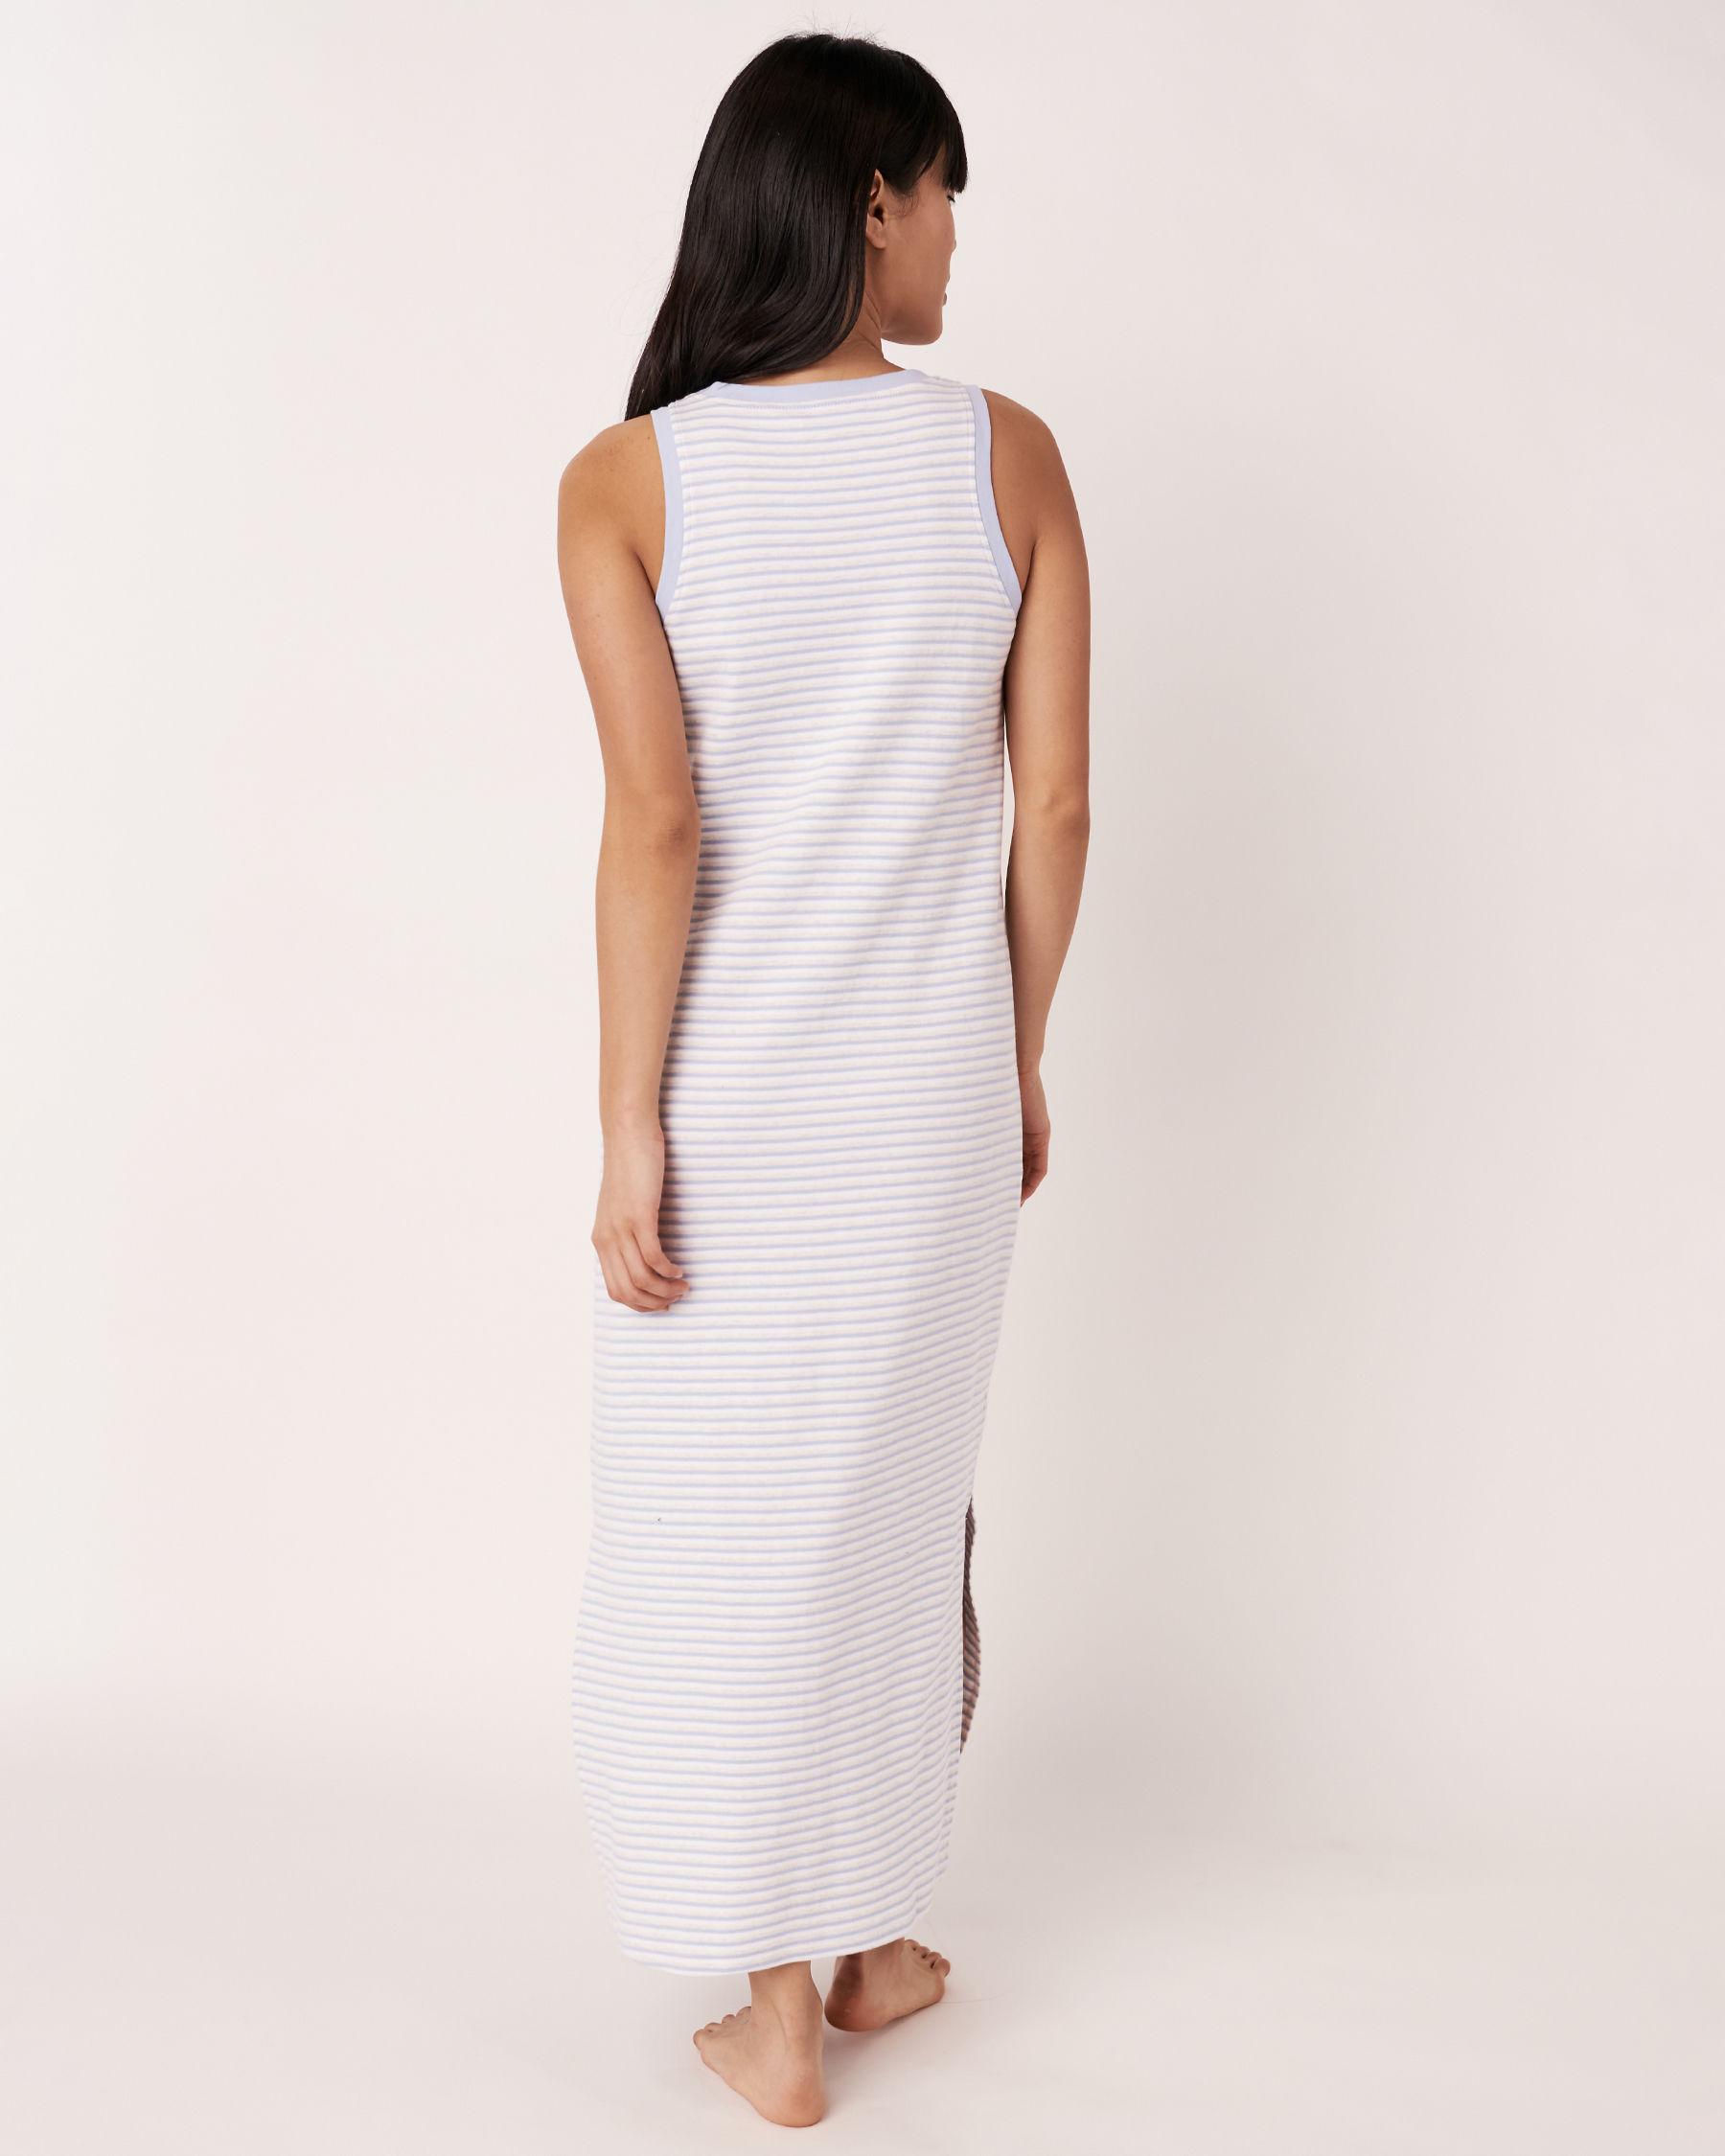 LA VIE EN ROSE Organic Cotton Sleeveless Long Sleepshirt Blue and white stripes 40500002 - View3